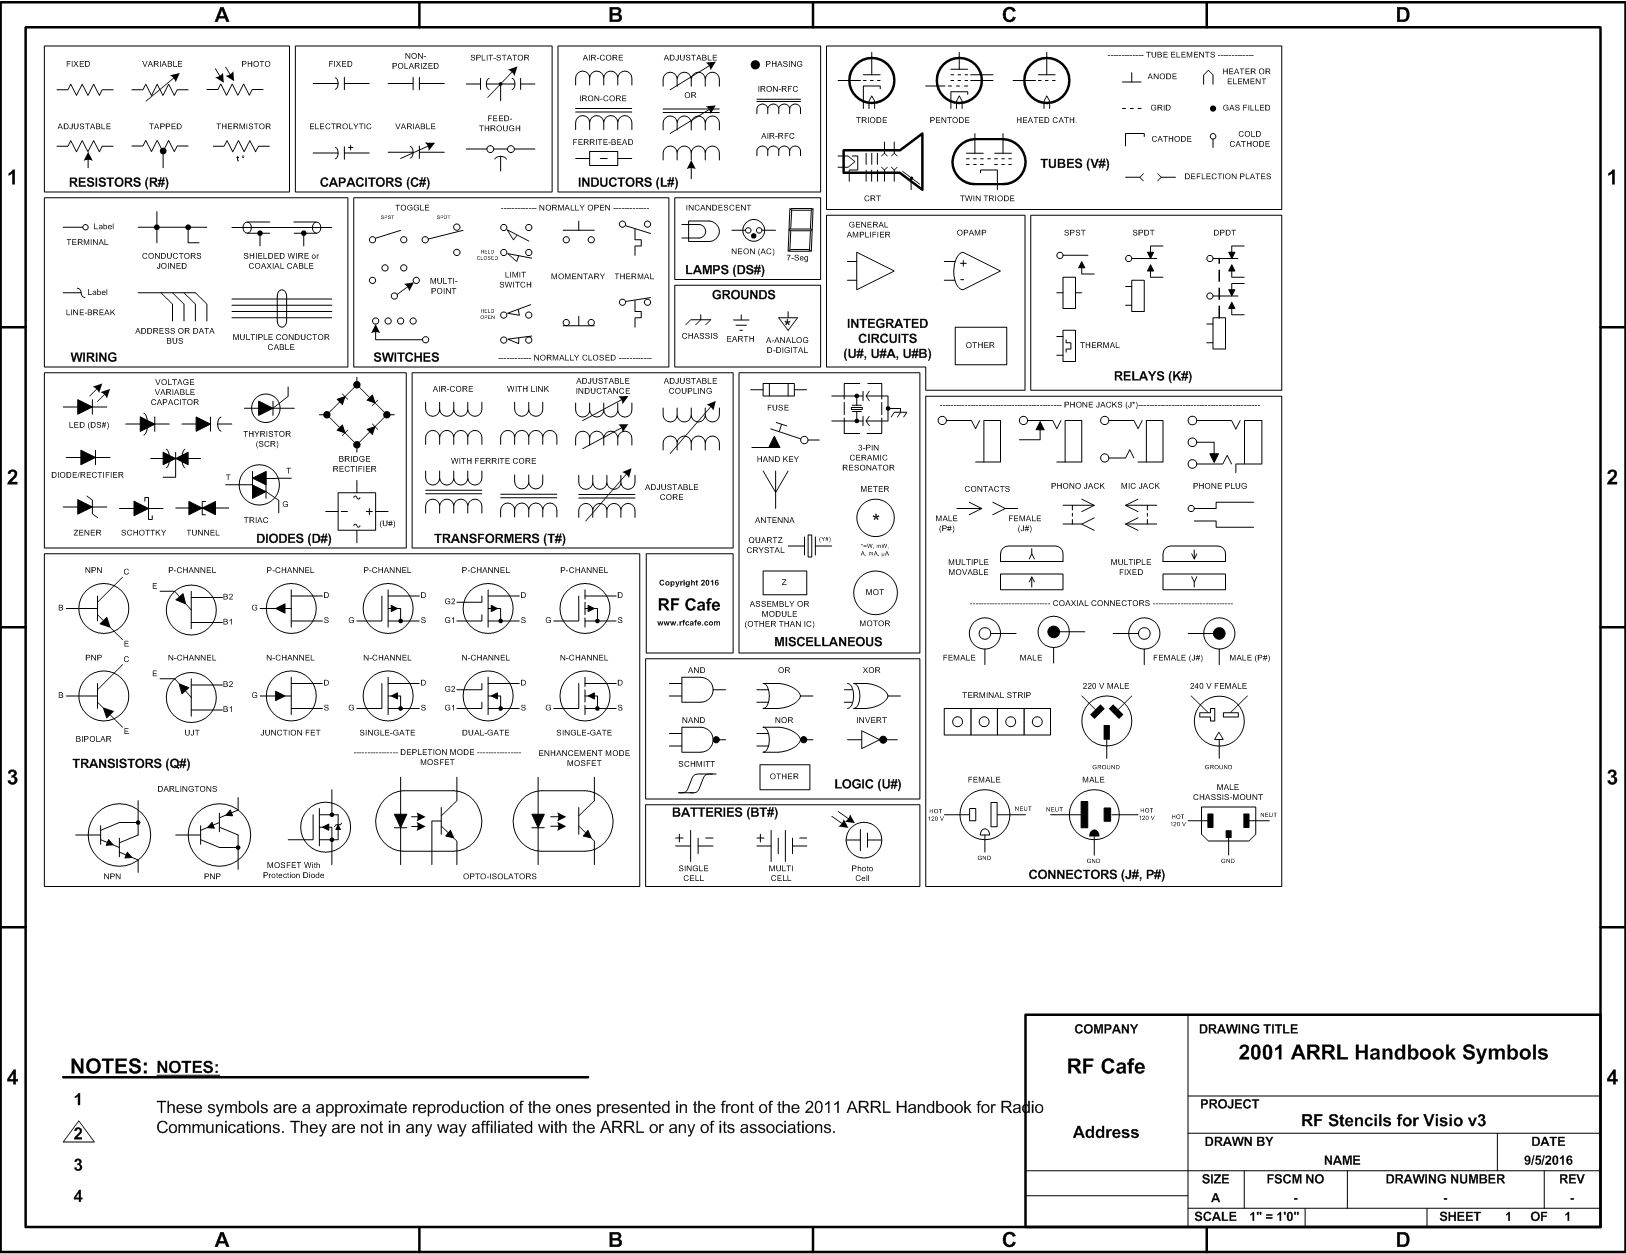 visio electrical diagram high school shot put wiring symbols